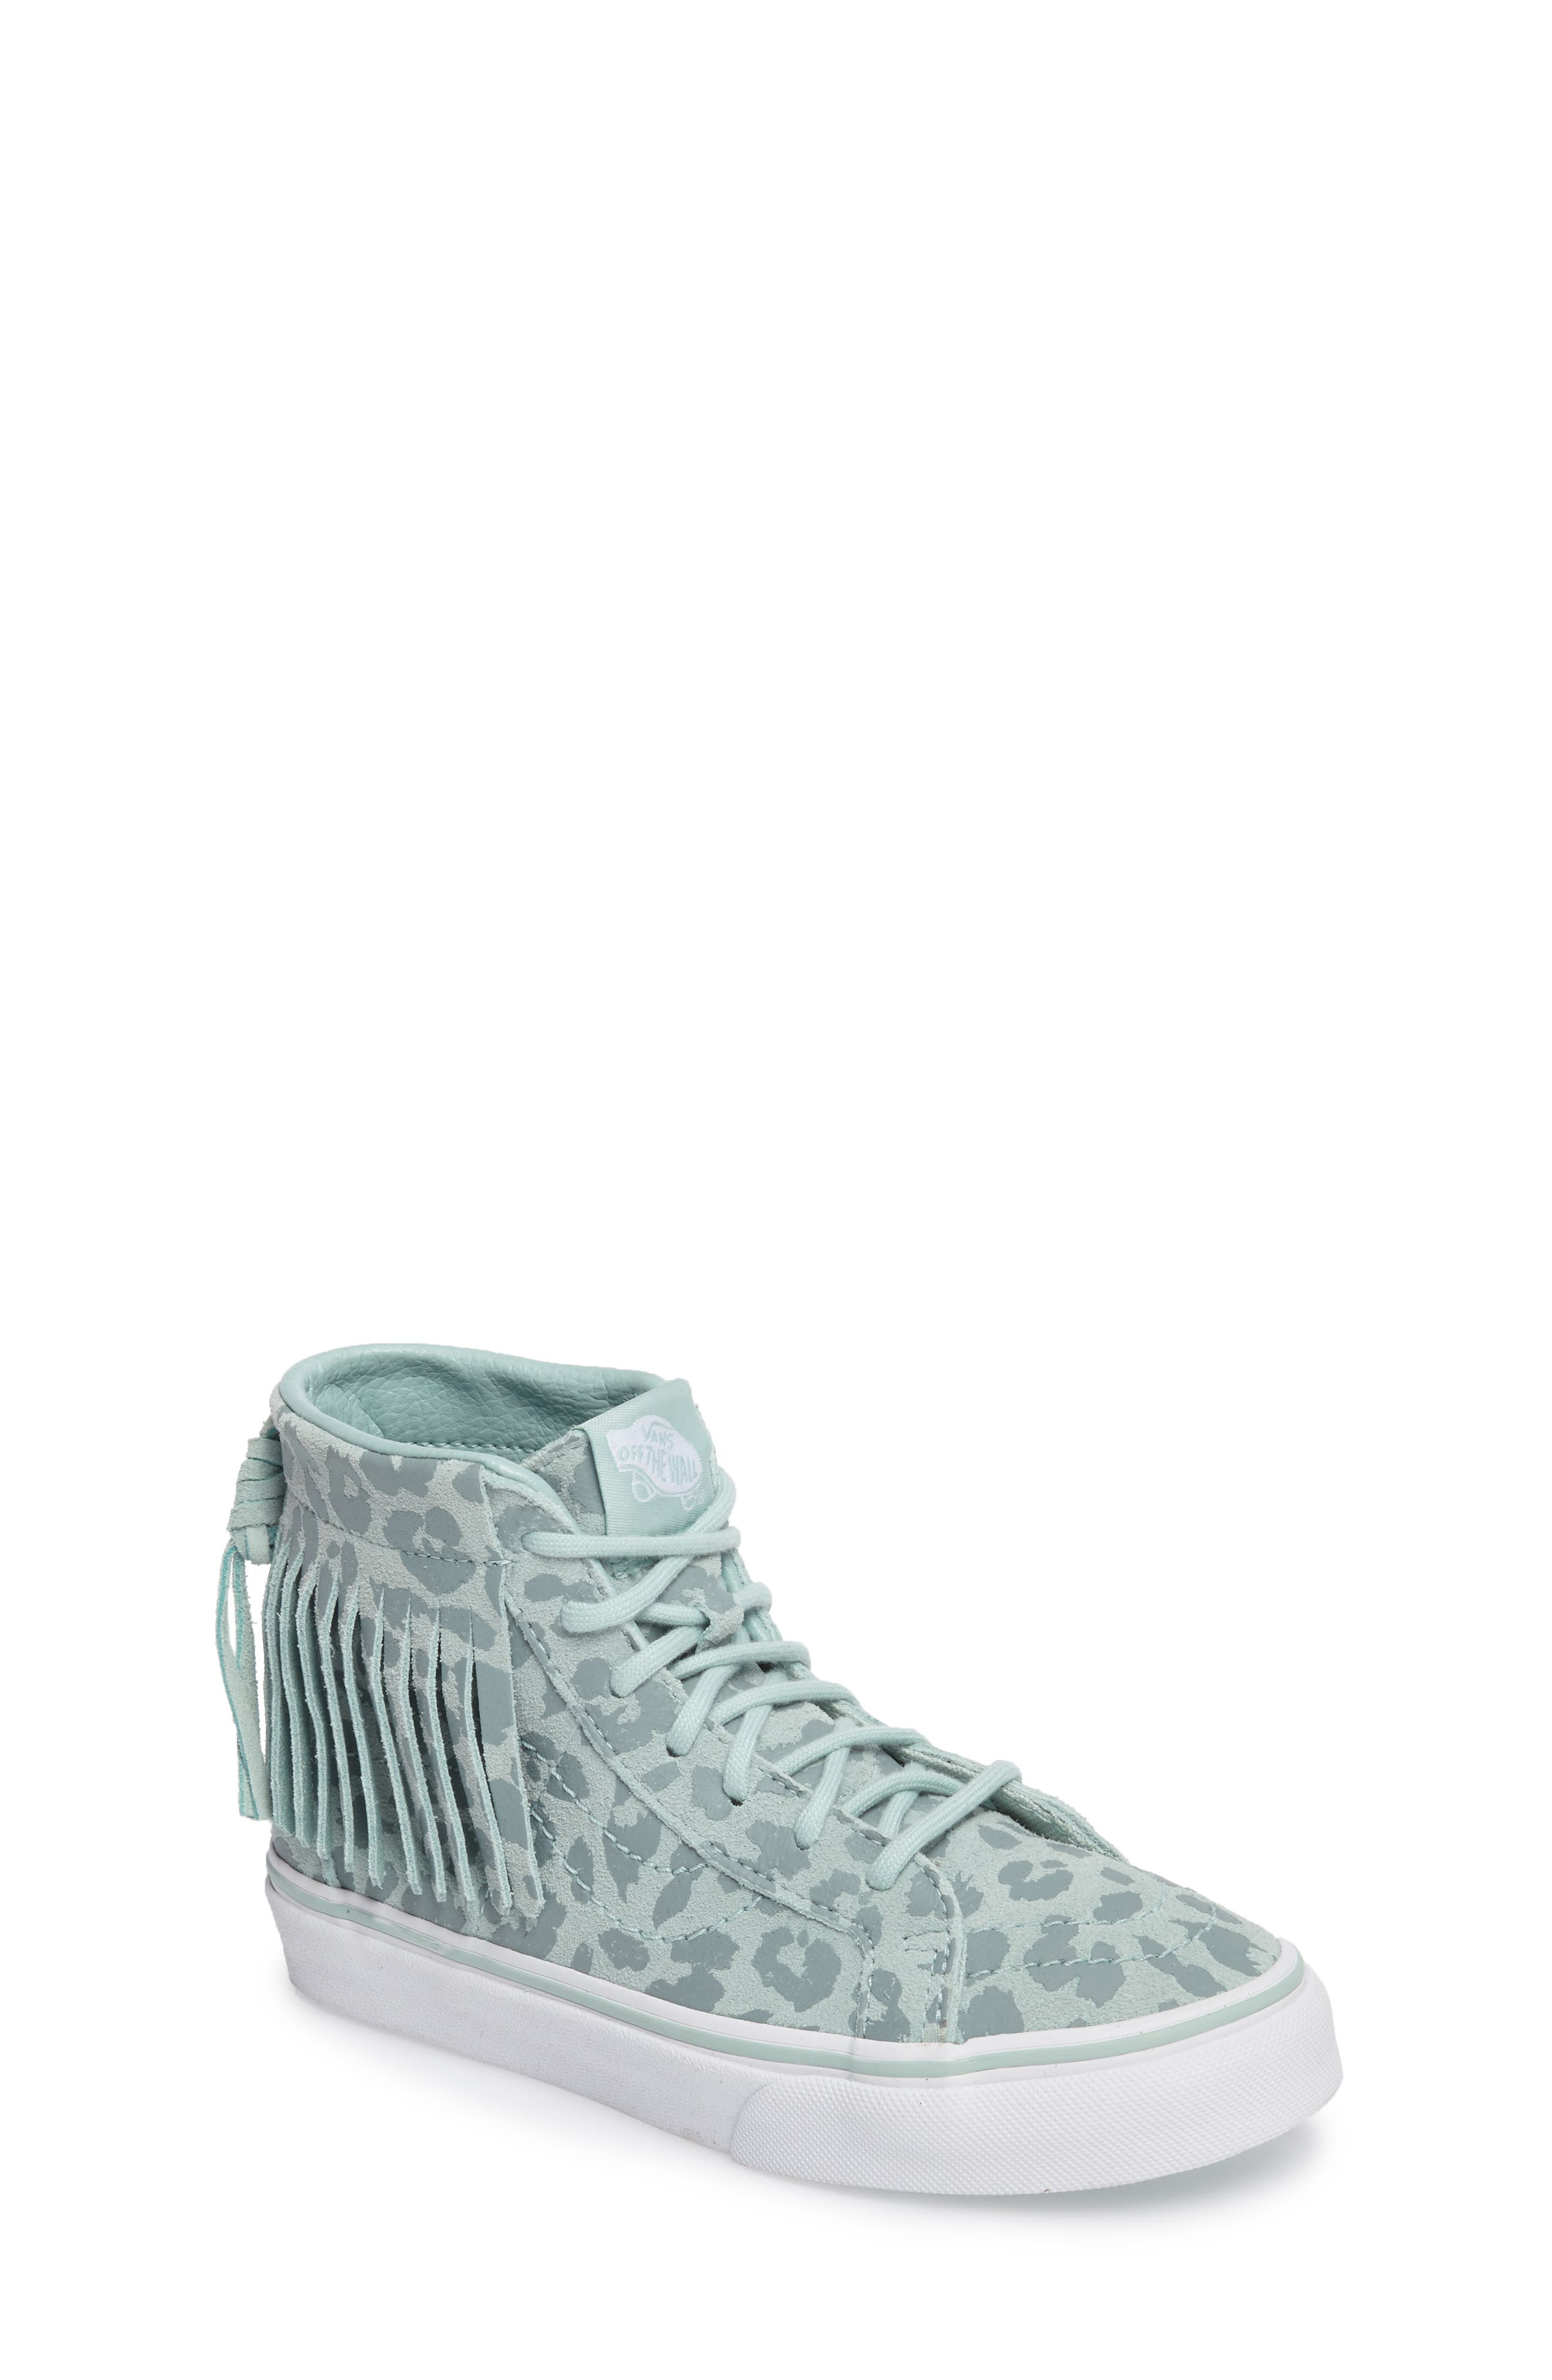 Chukka V Moc Sneaker,                         Main,                         color, Harbor Gray Leopard Suede